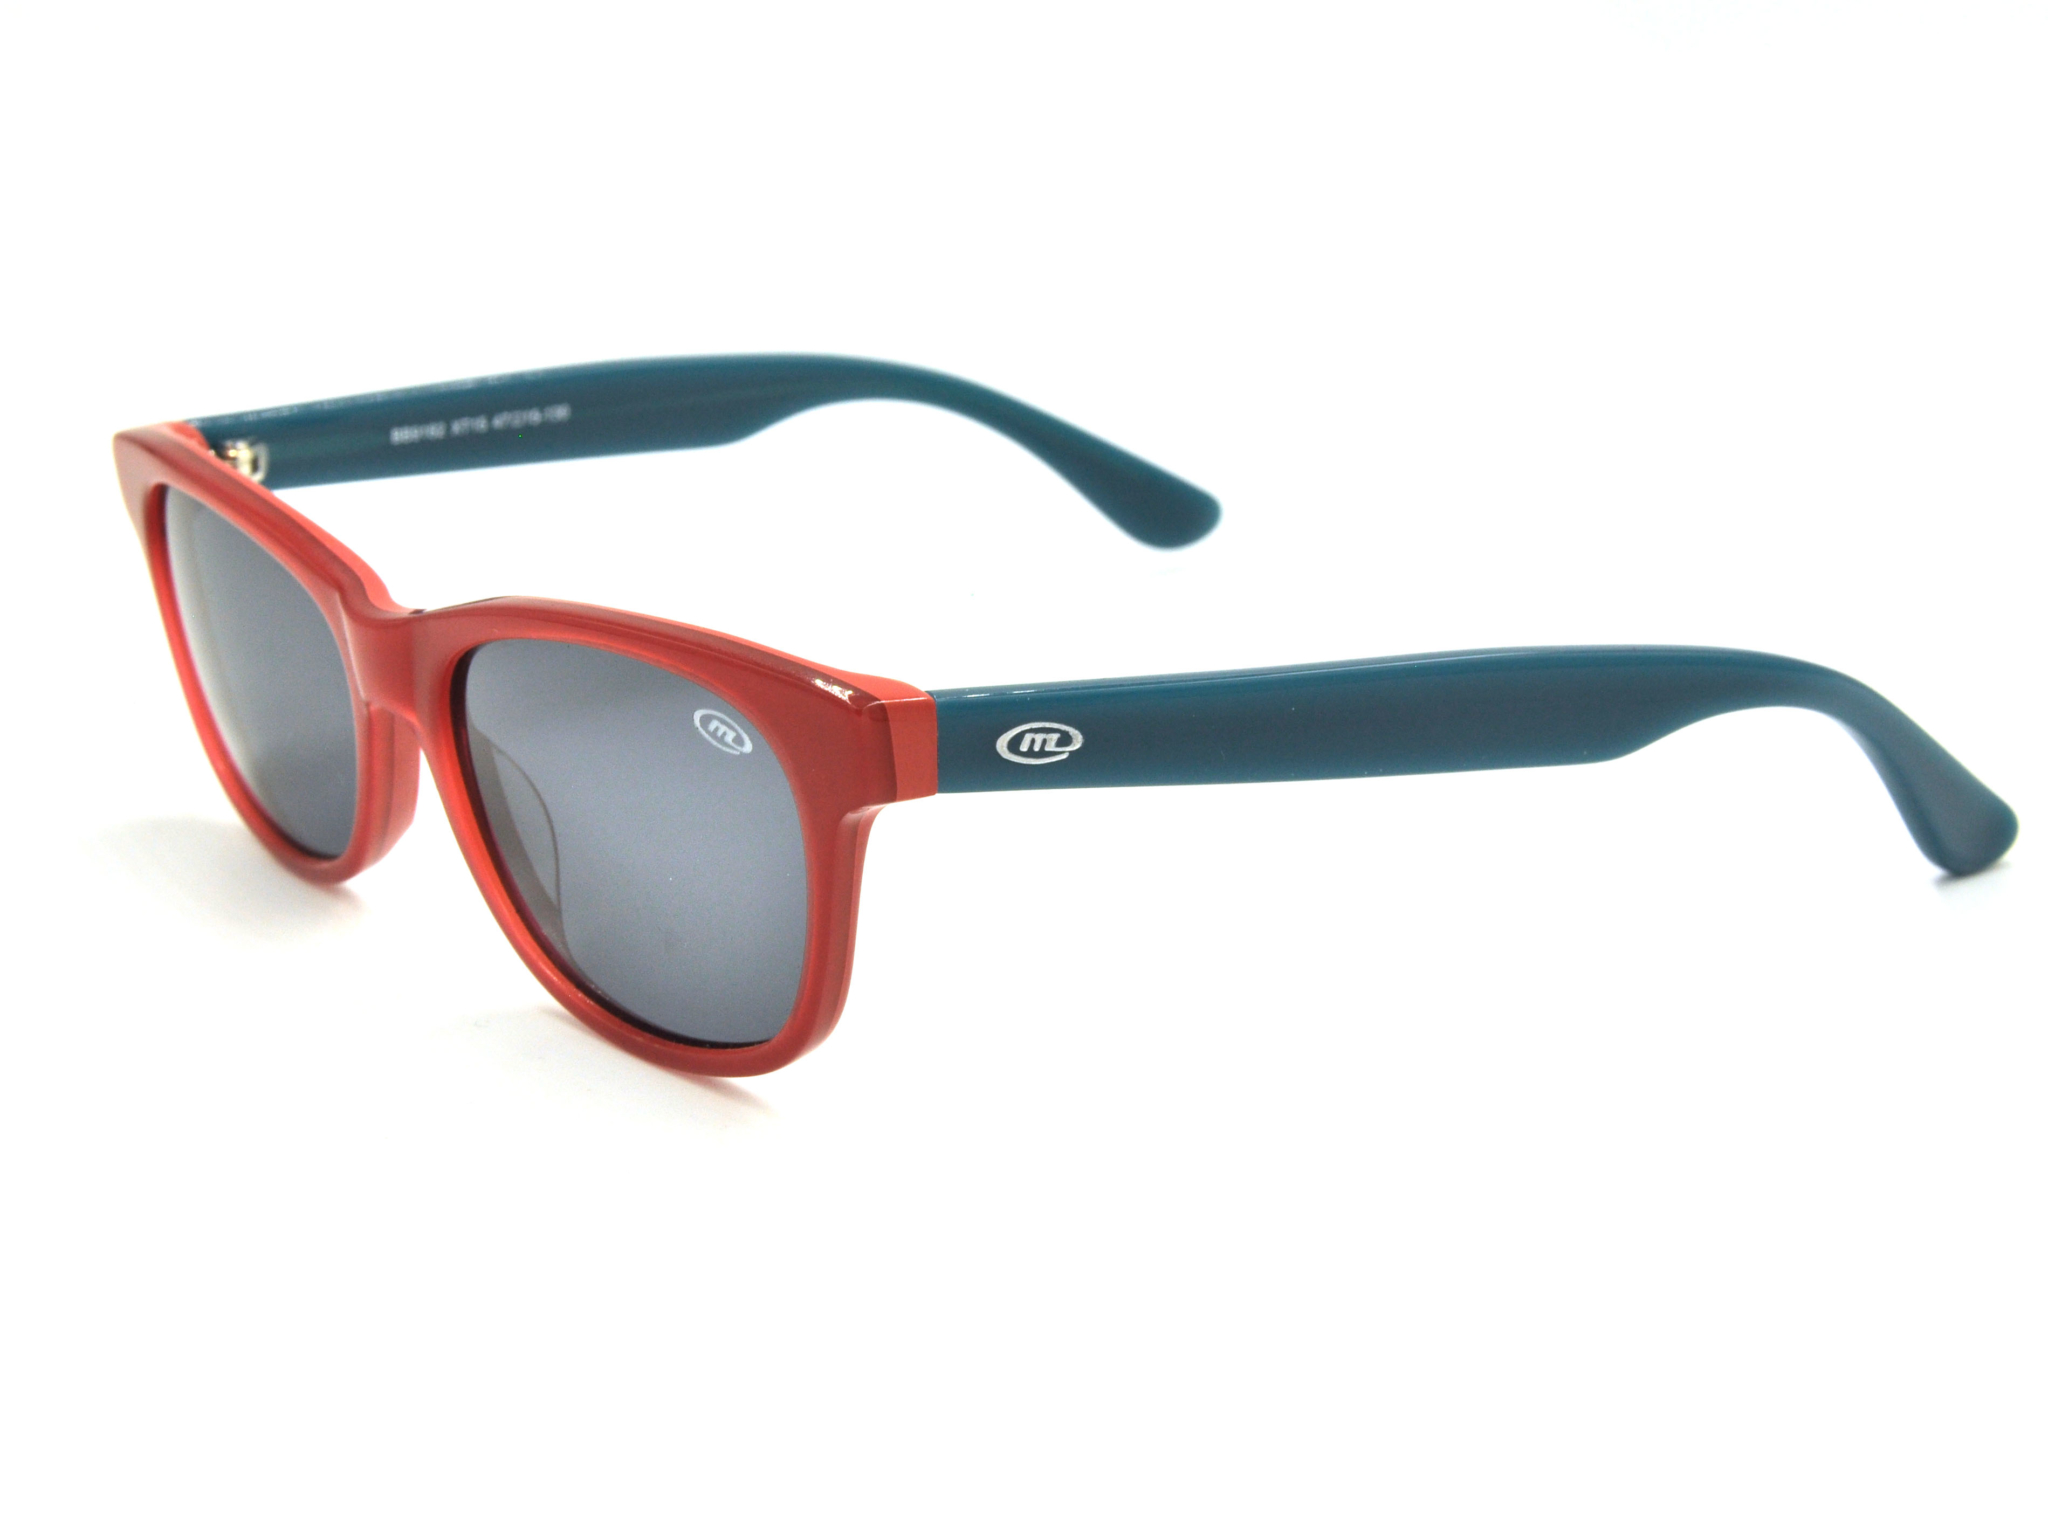 MORITZ JUNIOR BB9182 XT15 Sunglasses 2020